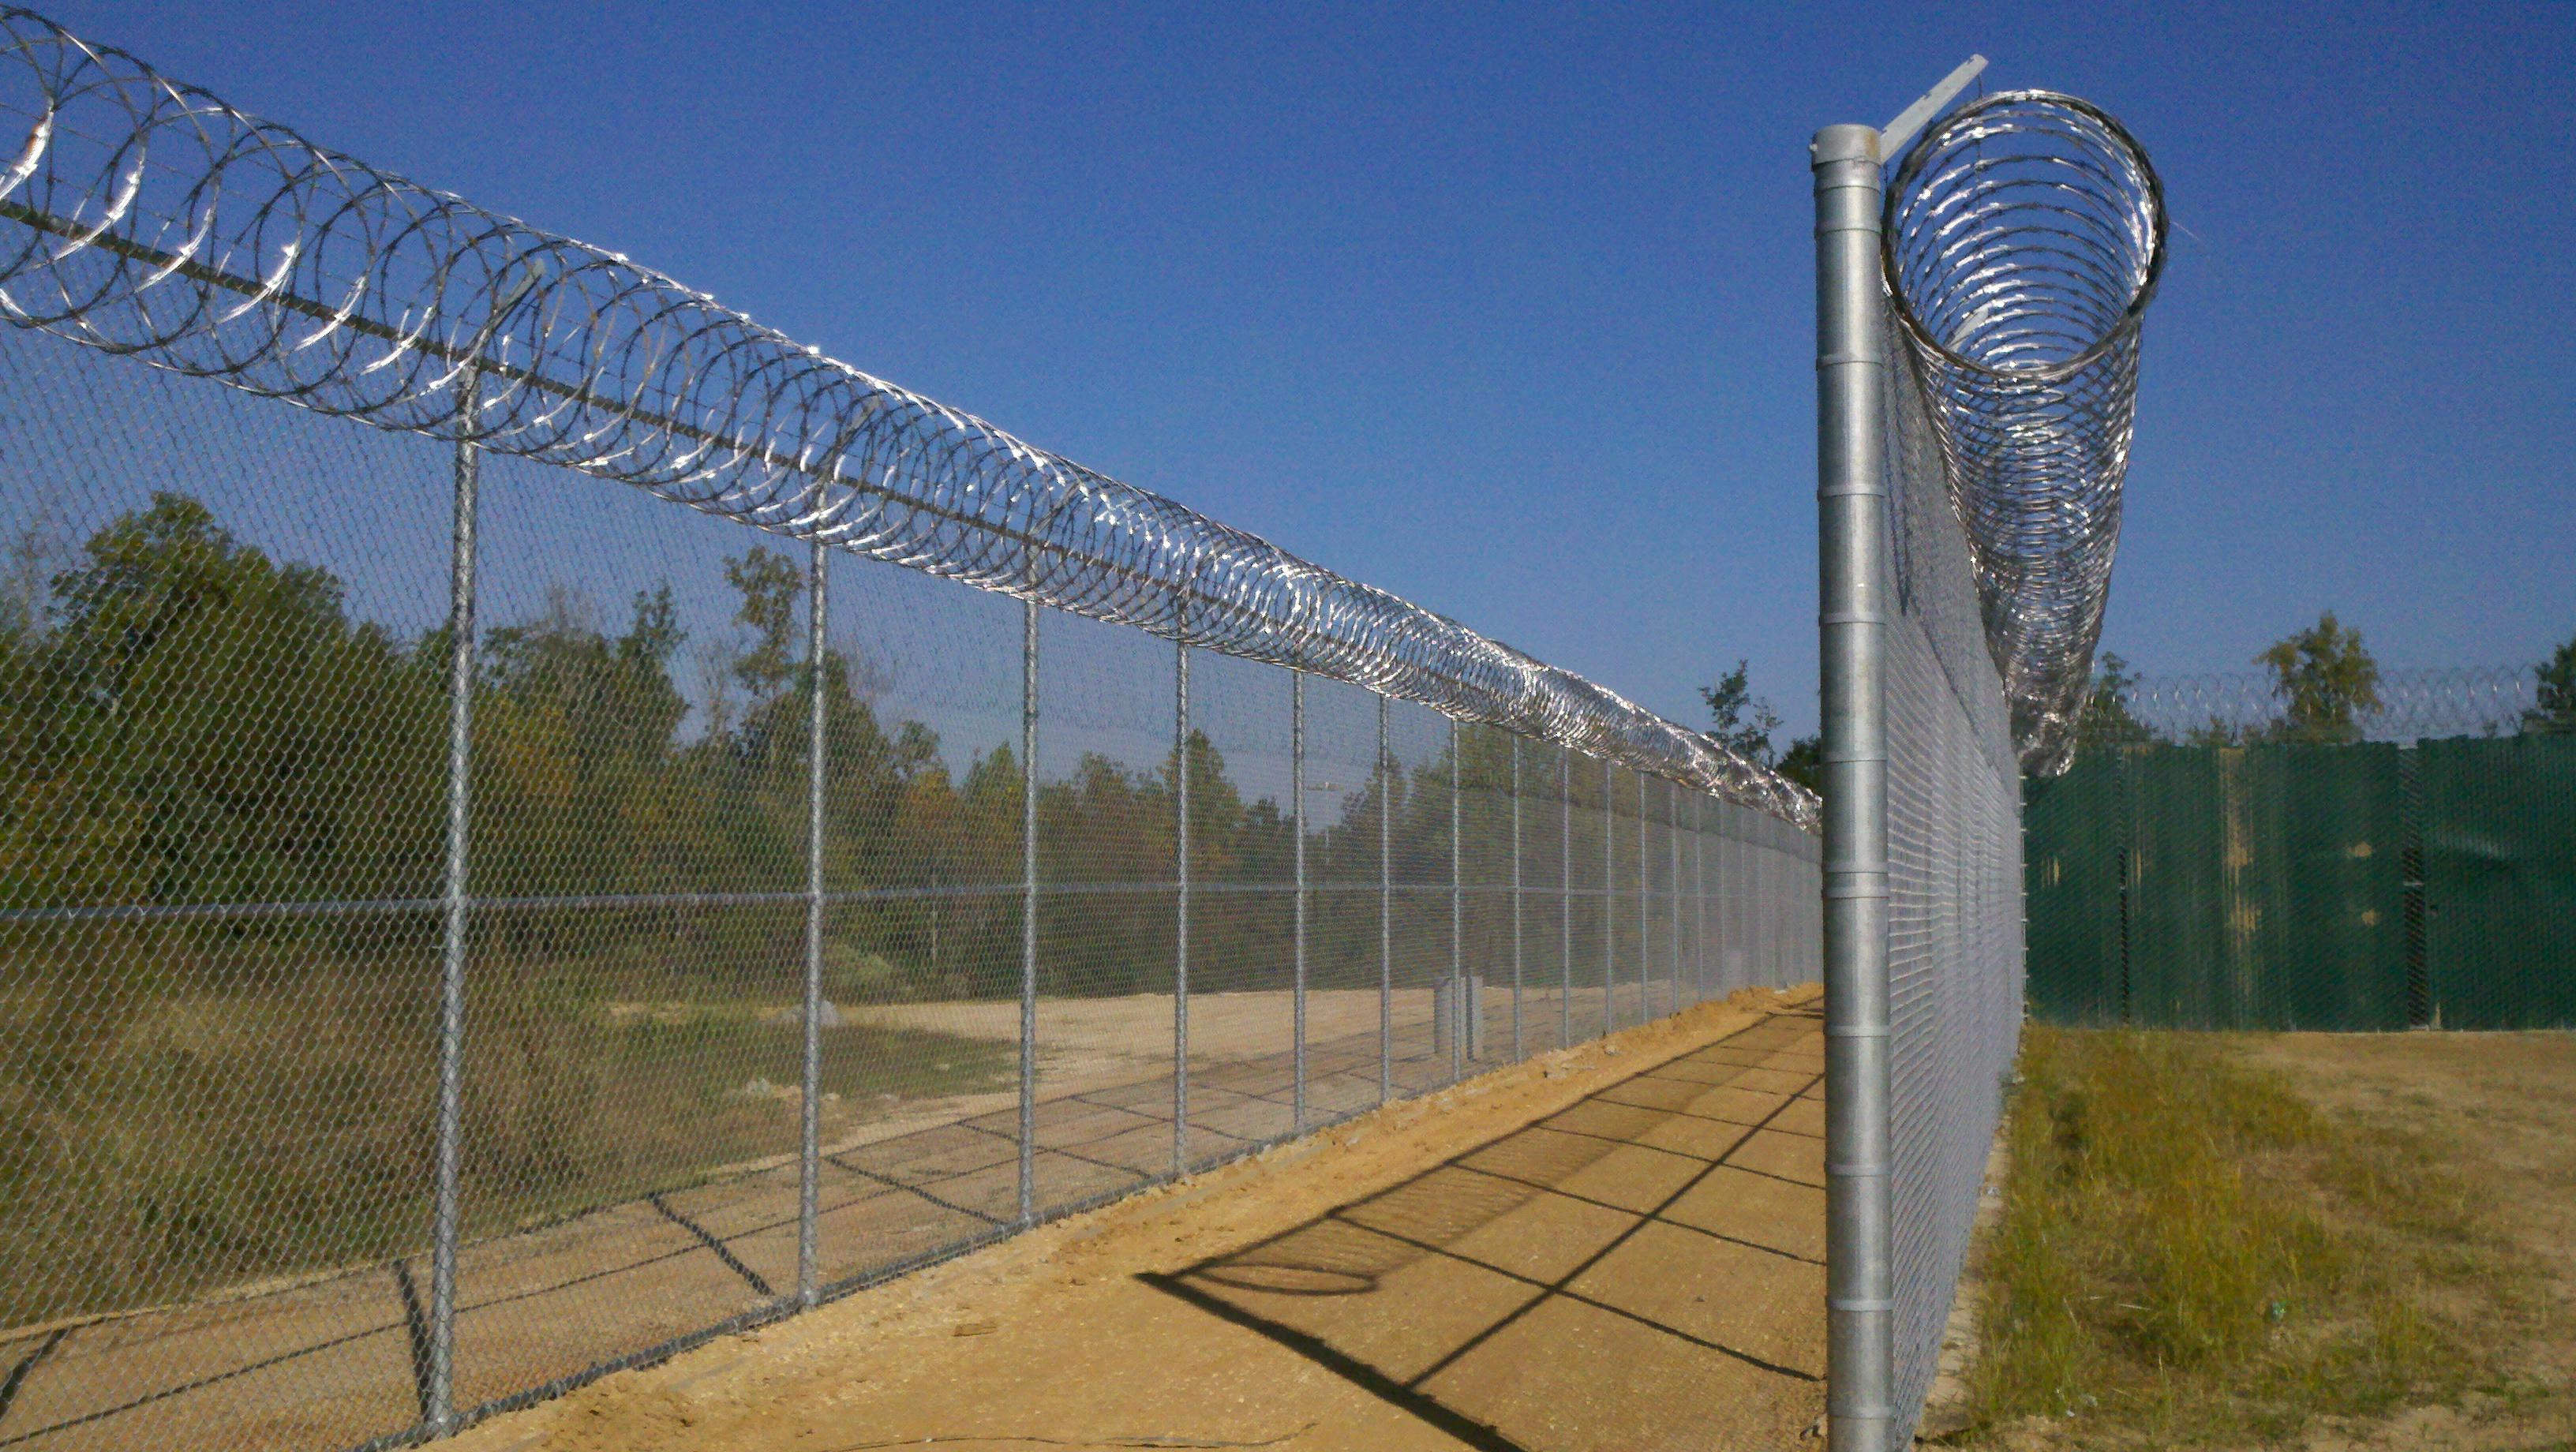 Chain Link Jefcoat Fence Company Of Hattiesburg